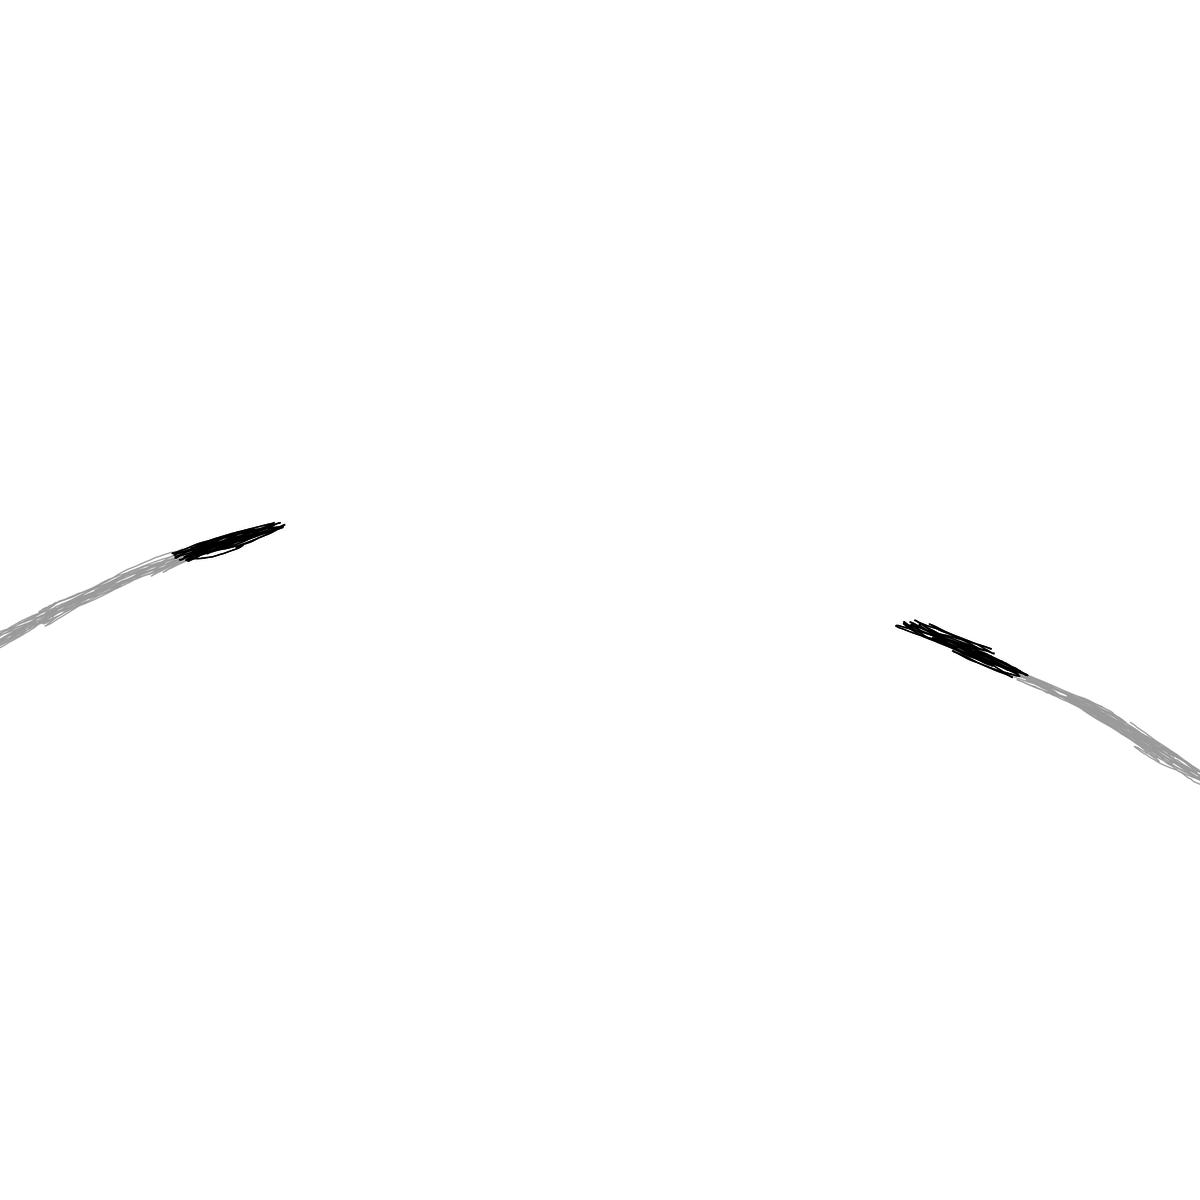 BAAAM drawing#778 lat:44.3512115478515600lng: -4.6807427406311035